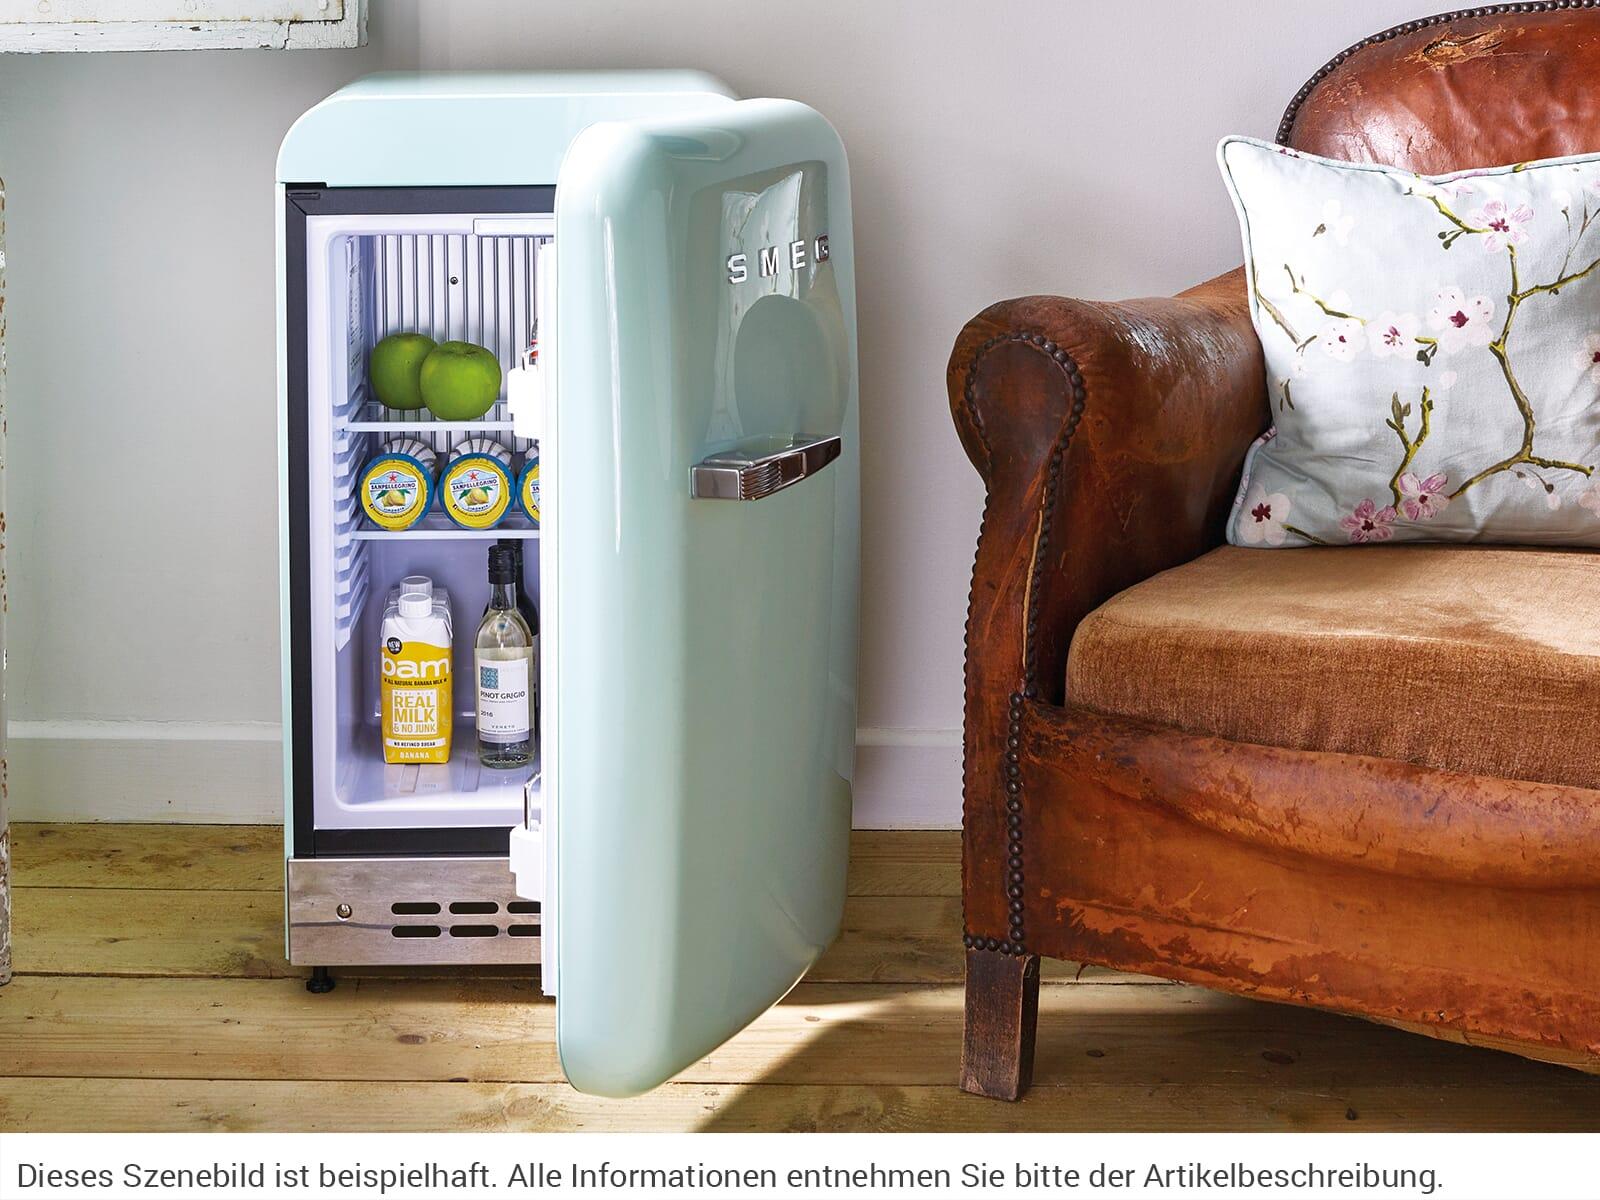 Smeg Unterbau Kühlschrank : Smeg fab5rpg stand flaschenkühlschrank pastellgrün